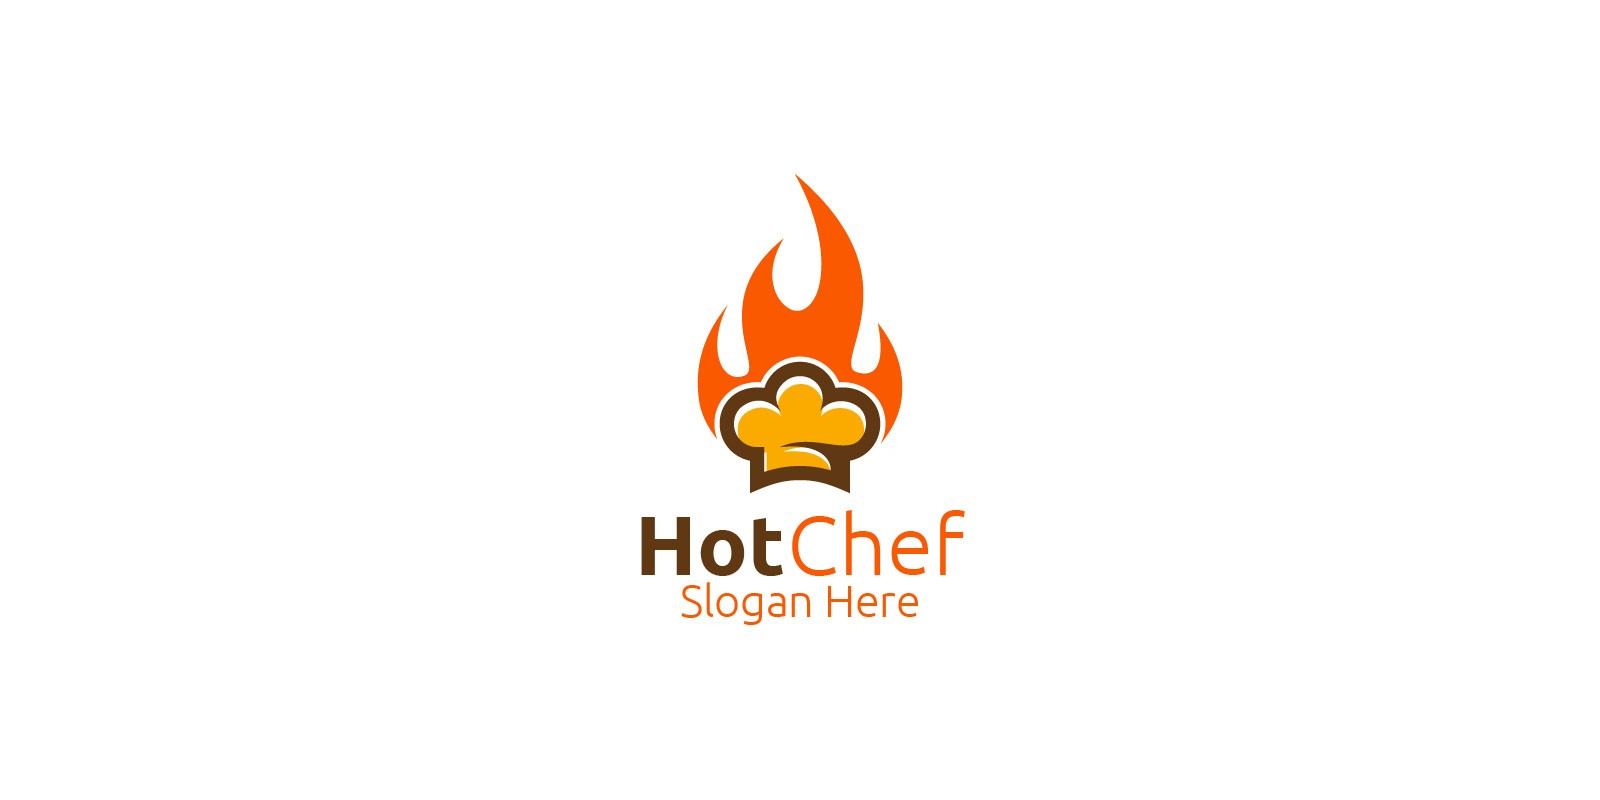 Hot Chef Food Logo For Restaurant Or Cafe